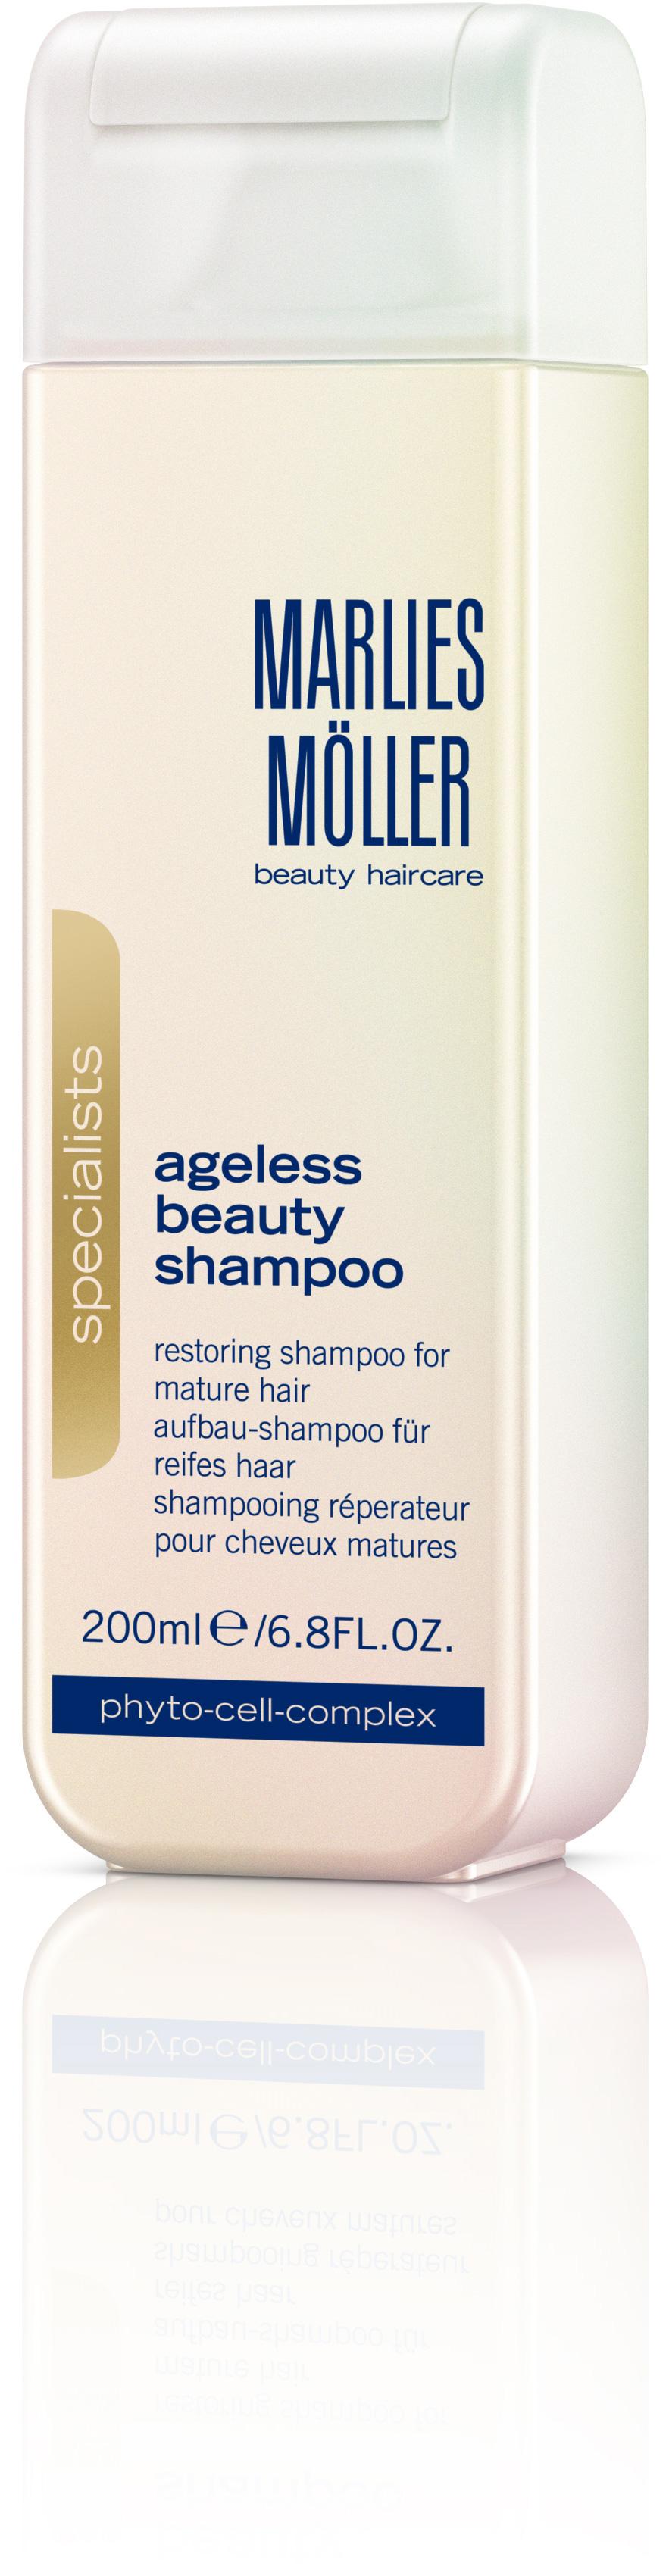 Marlies Möller Ageless Restoring Shampoo 200 ml